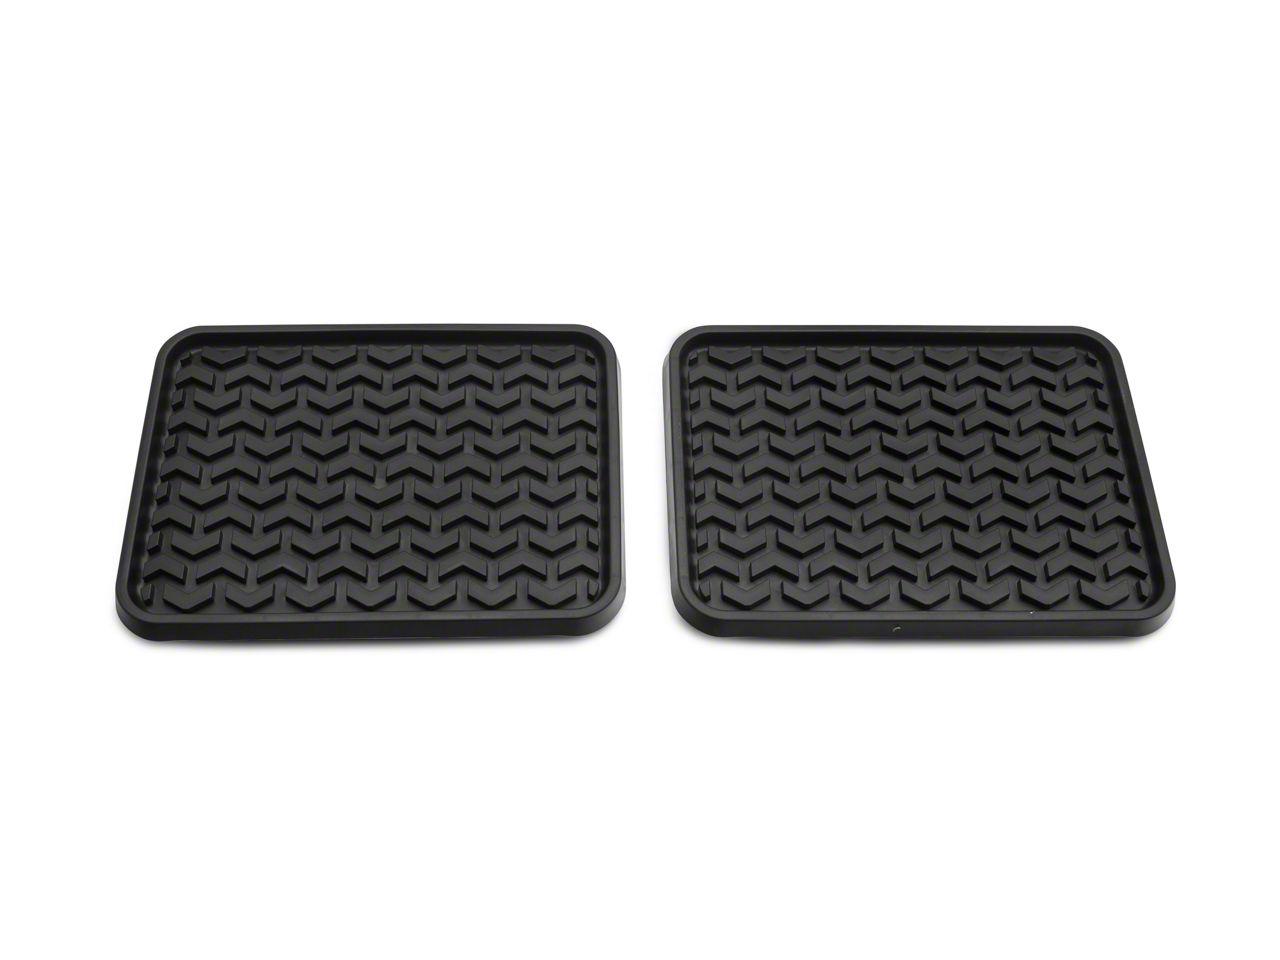 Rugged Ridge Rear Floor Mats - Black (02-18 RAM 1500 Quad Cab, Crew Cab, Mega Cab)